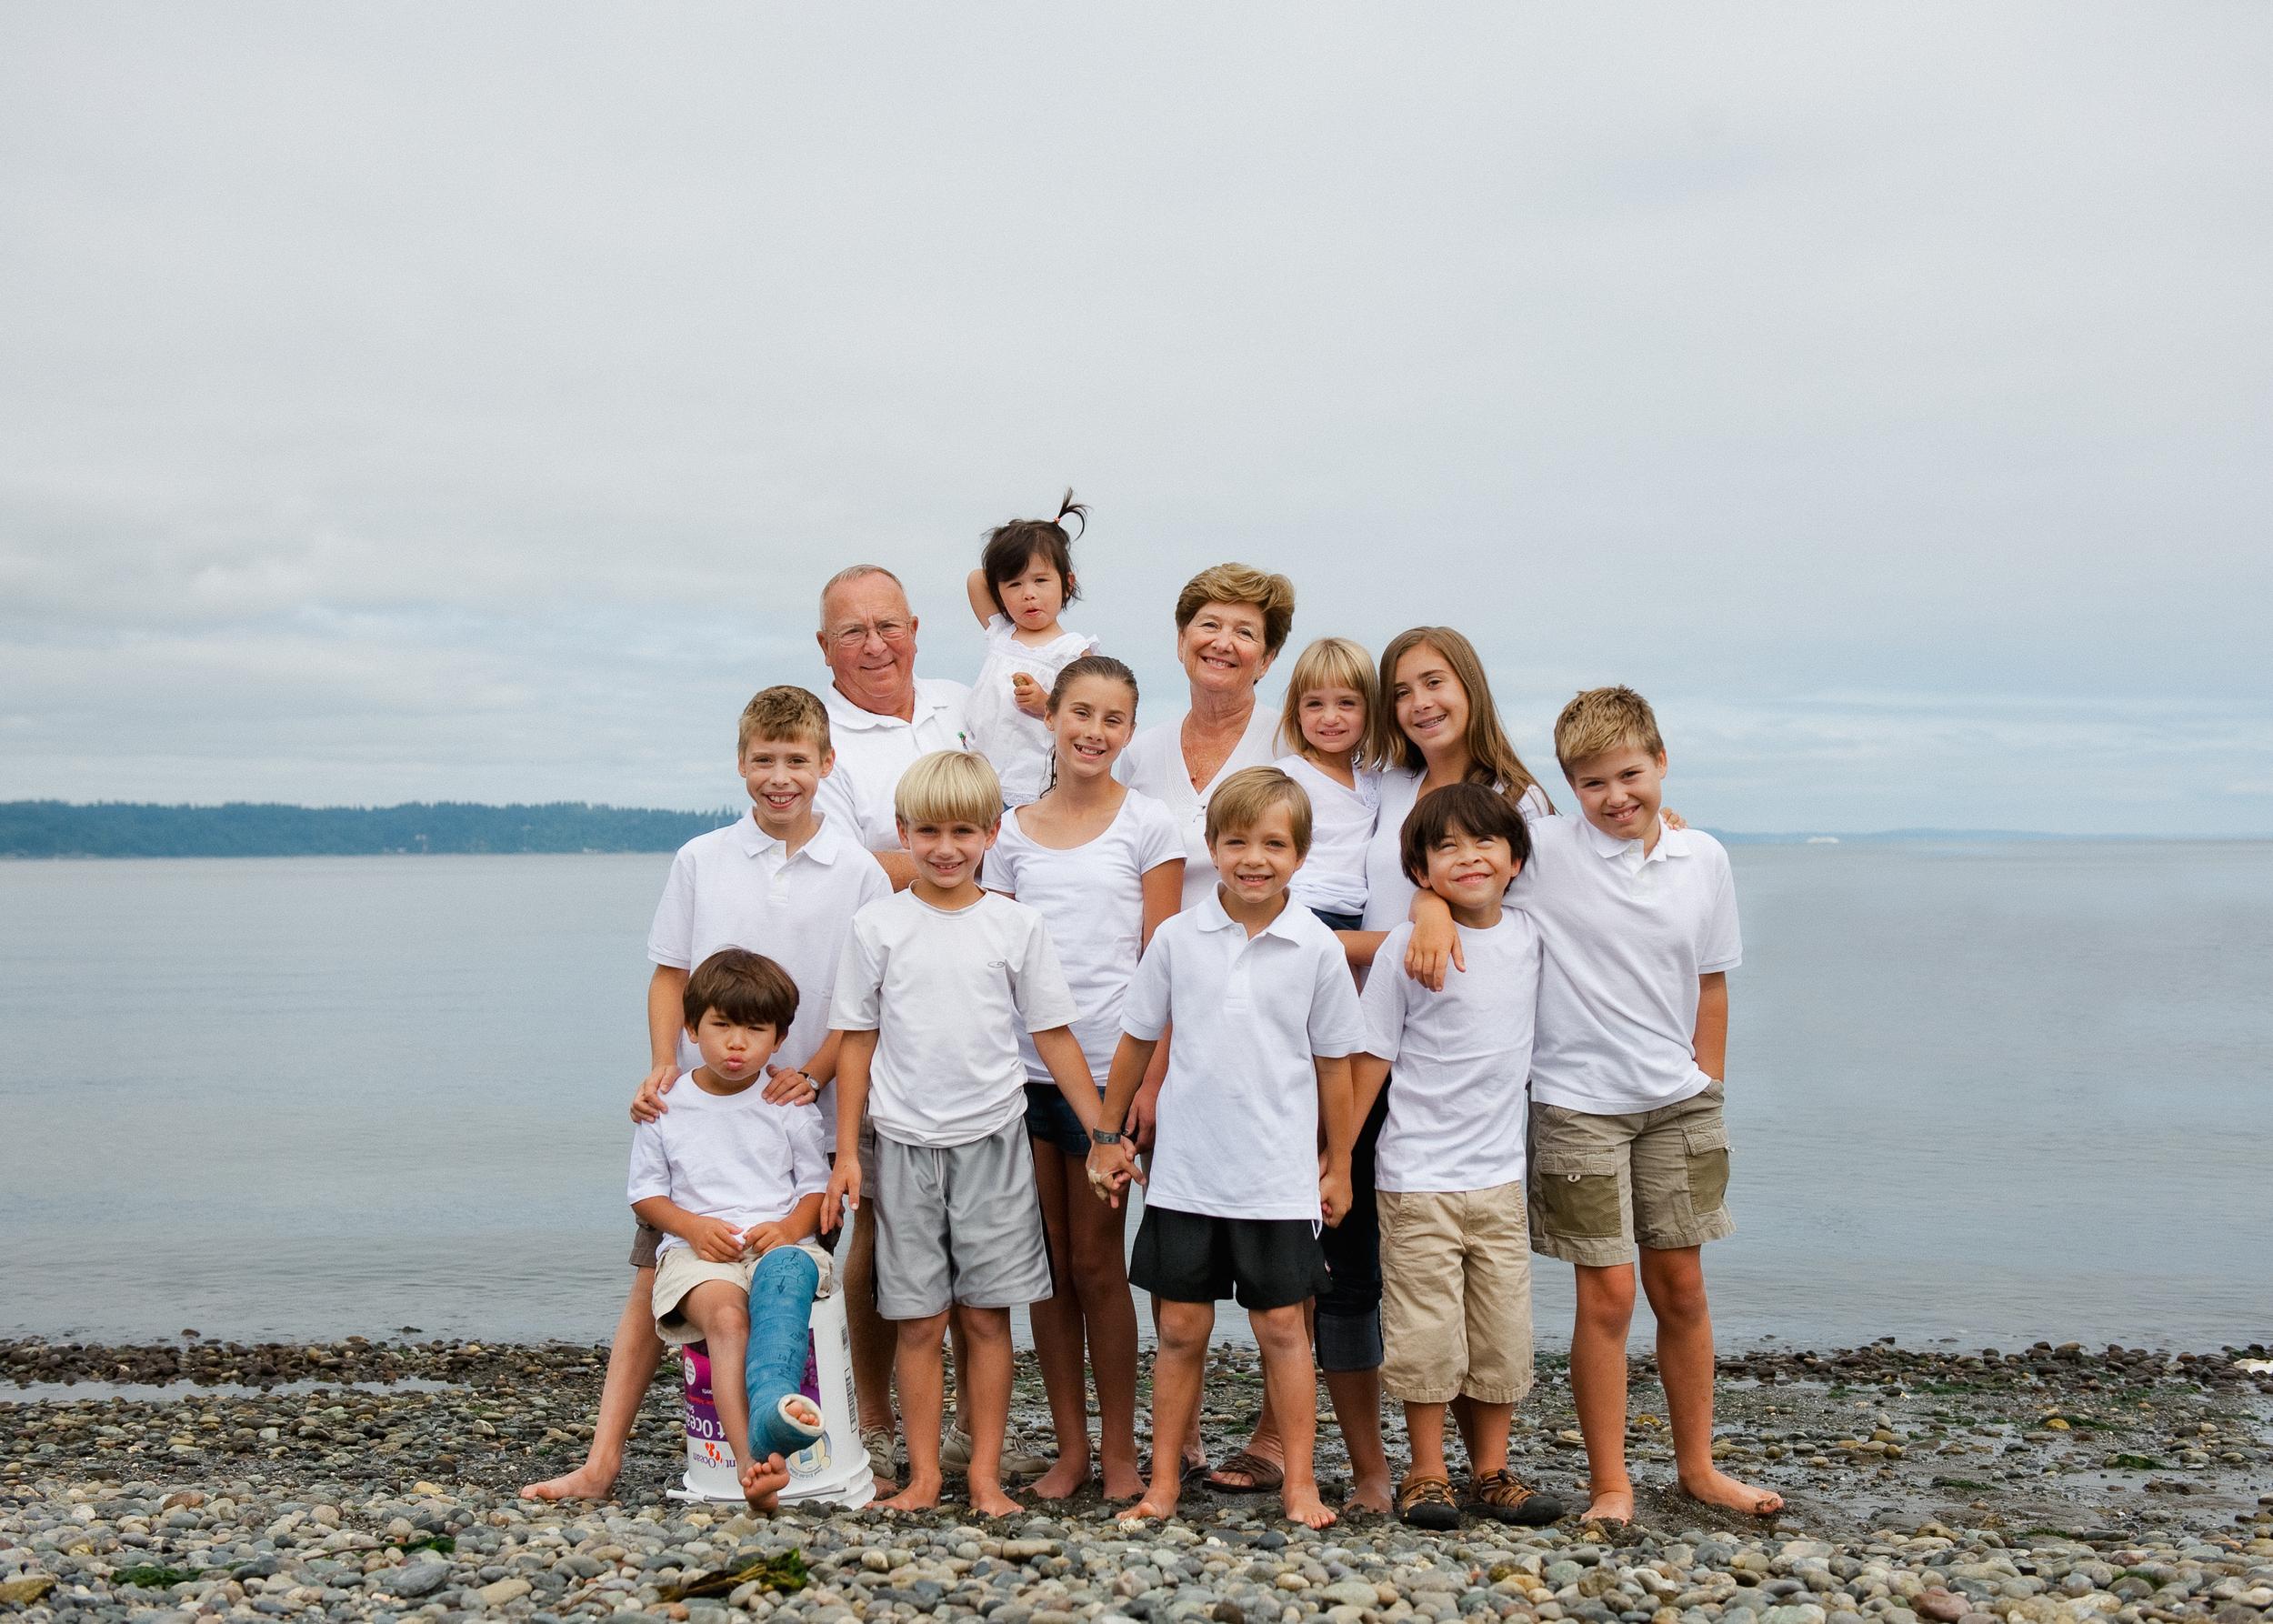 seattle-family-portrait-photographer-14.jpg